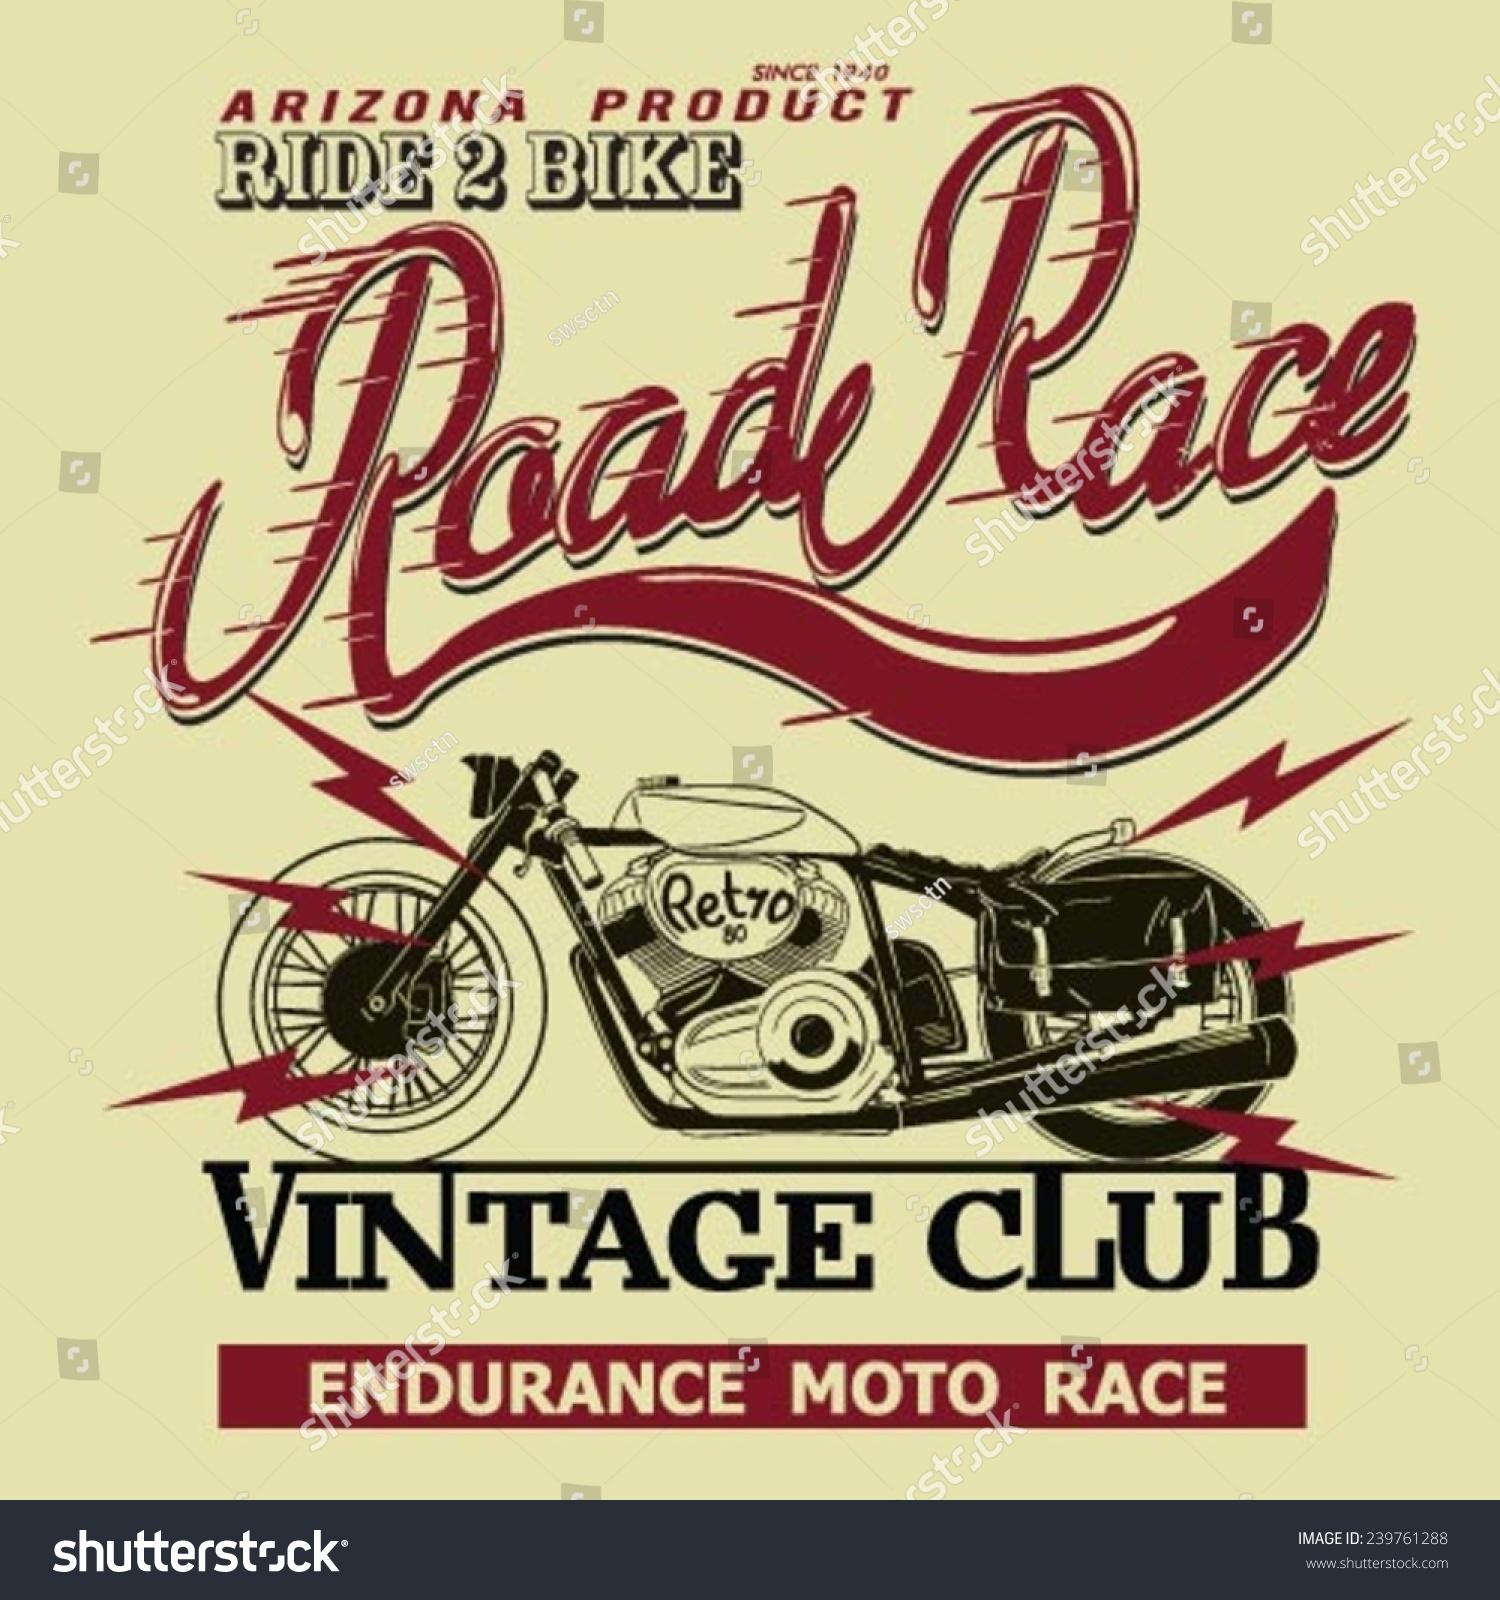 Vintage Racing Gear 78